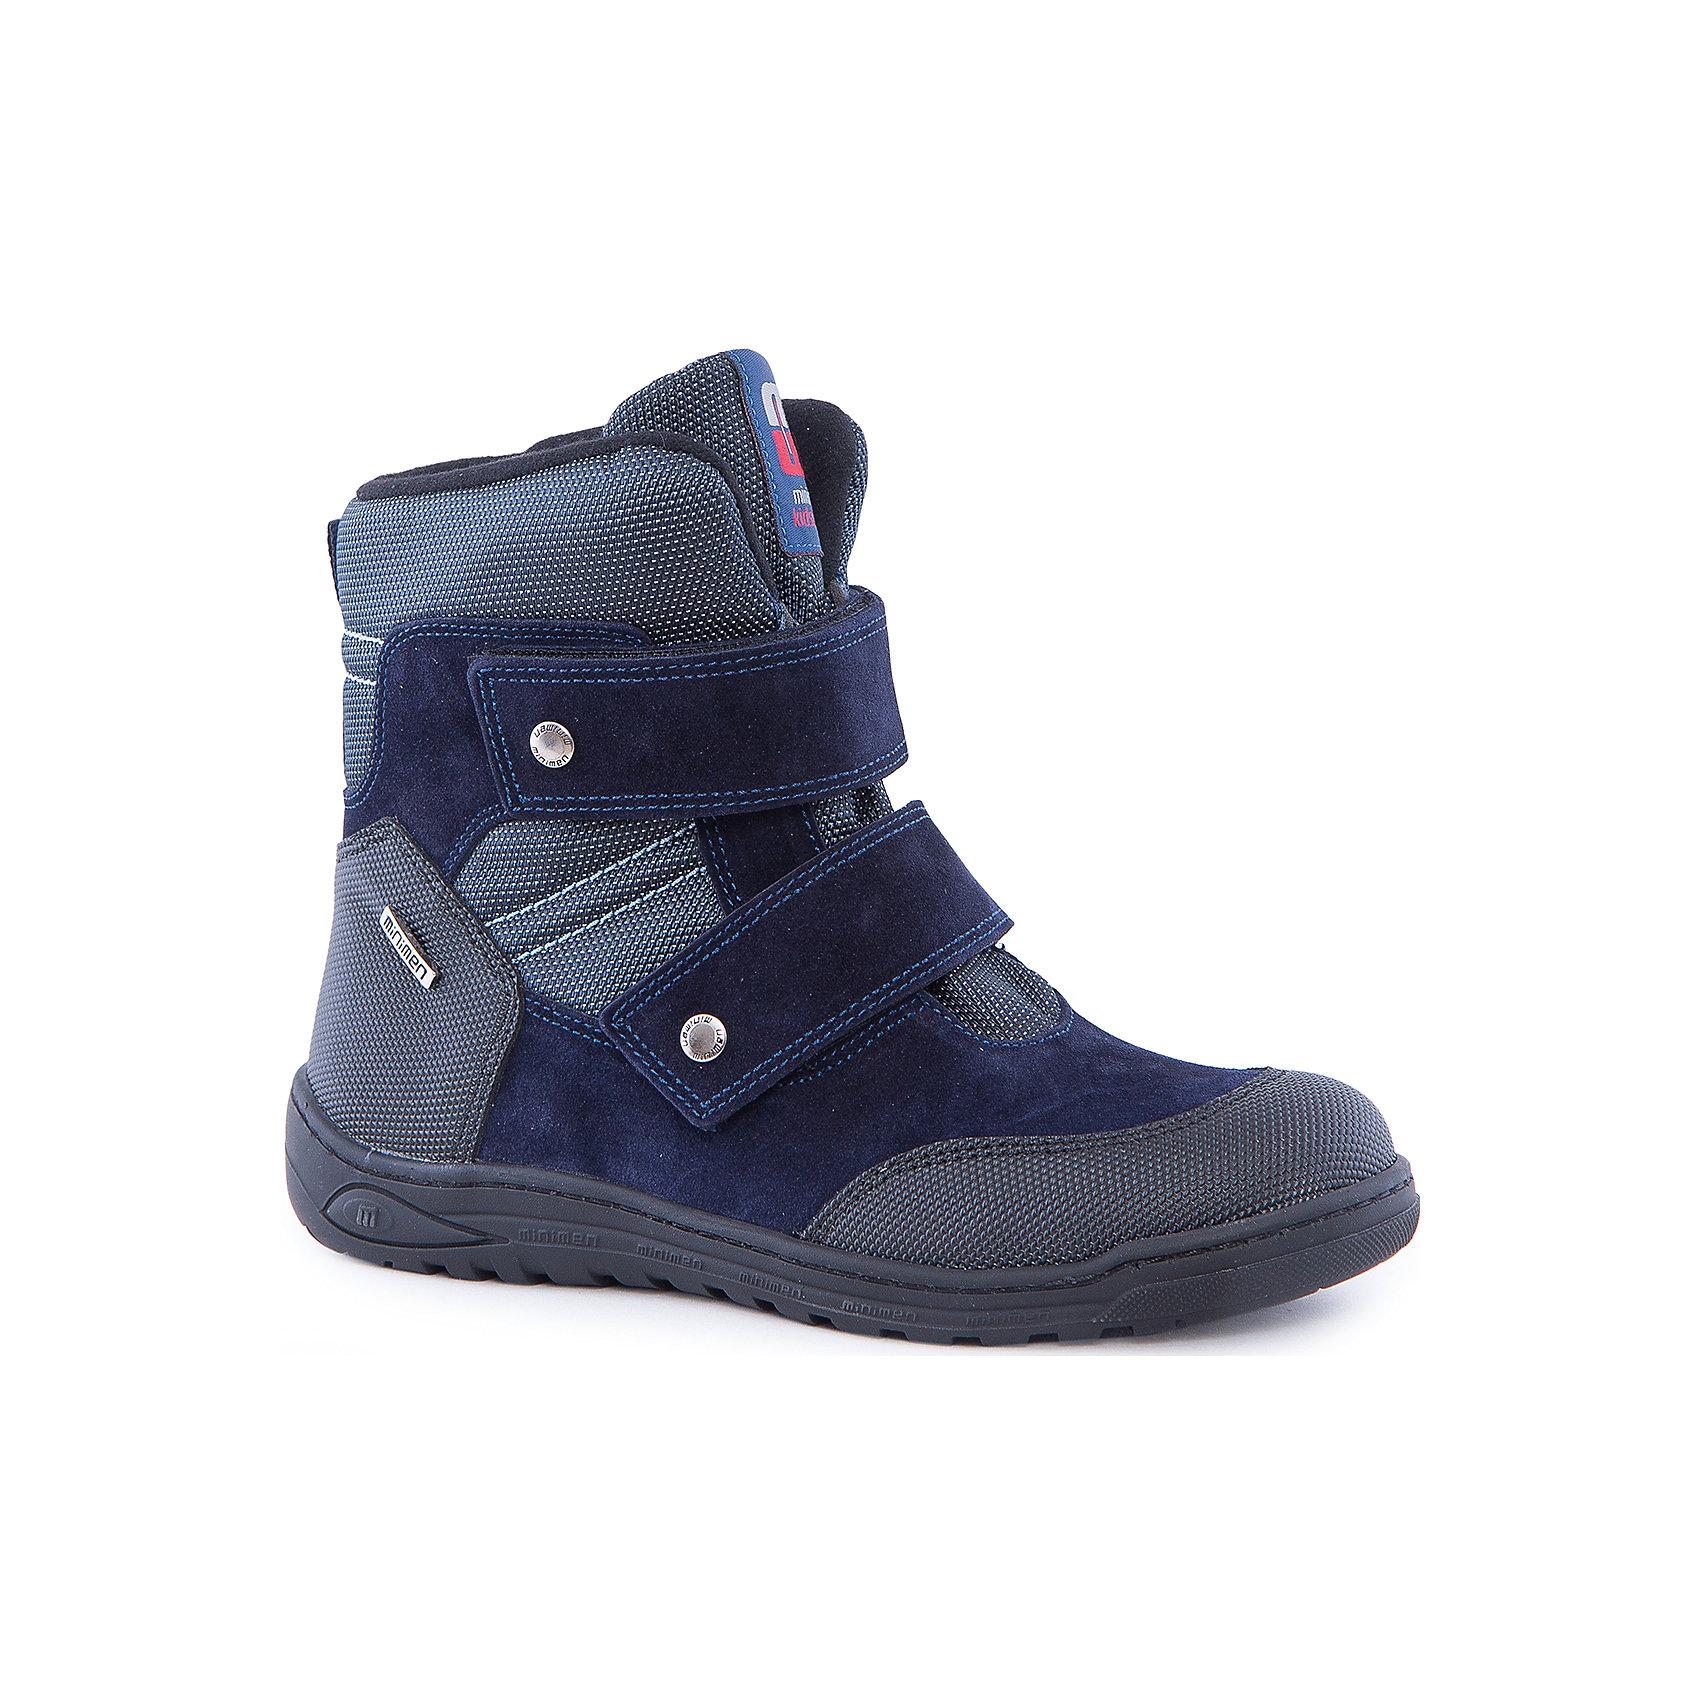 Minimen Ботинки для мальчика Minimen ботинки со скидкой в интернет магазинах